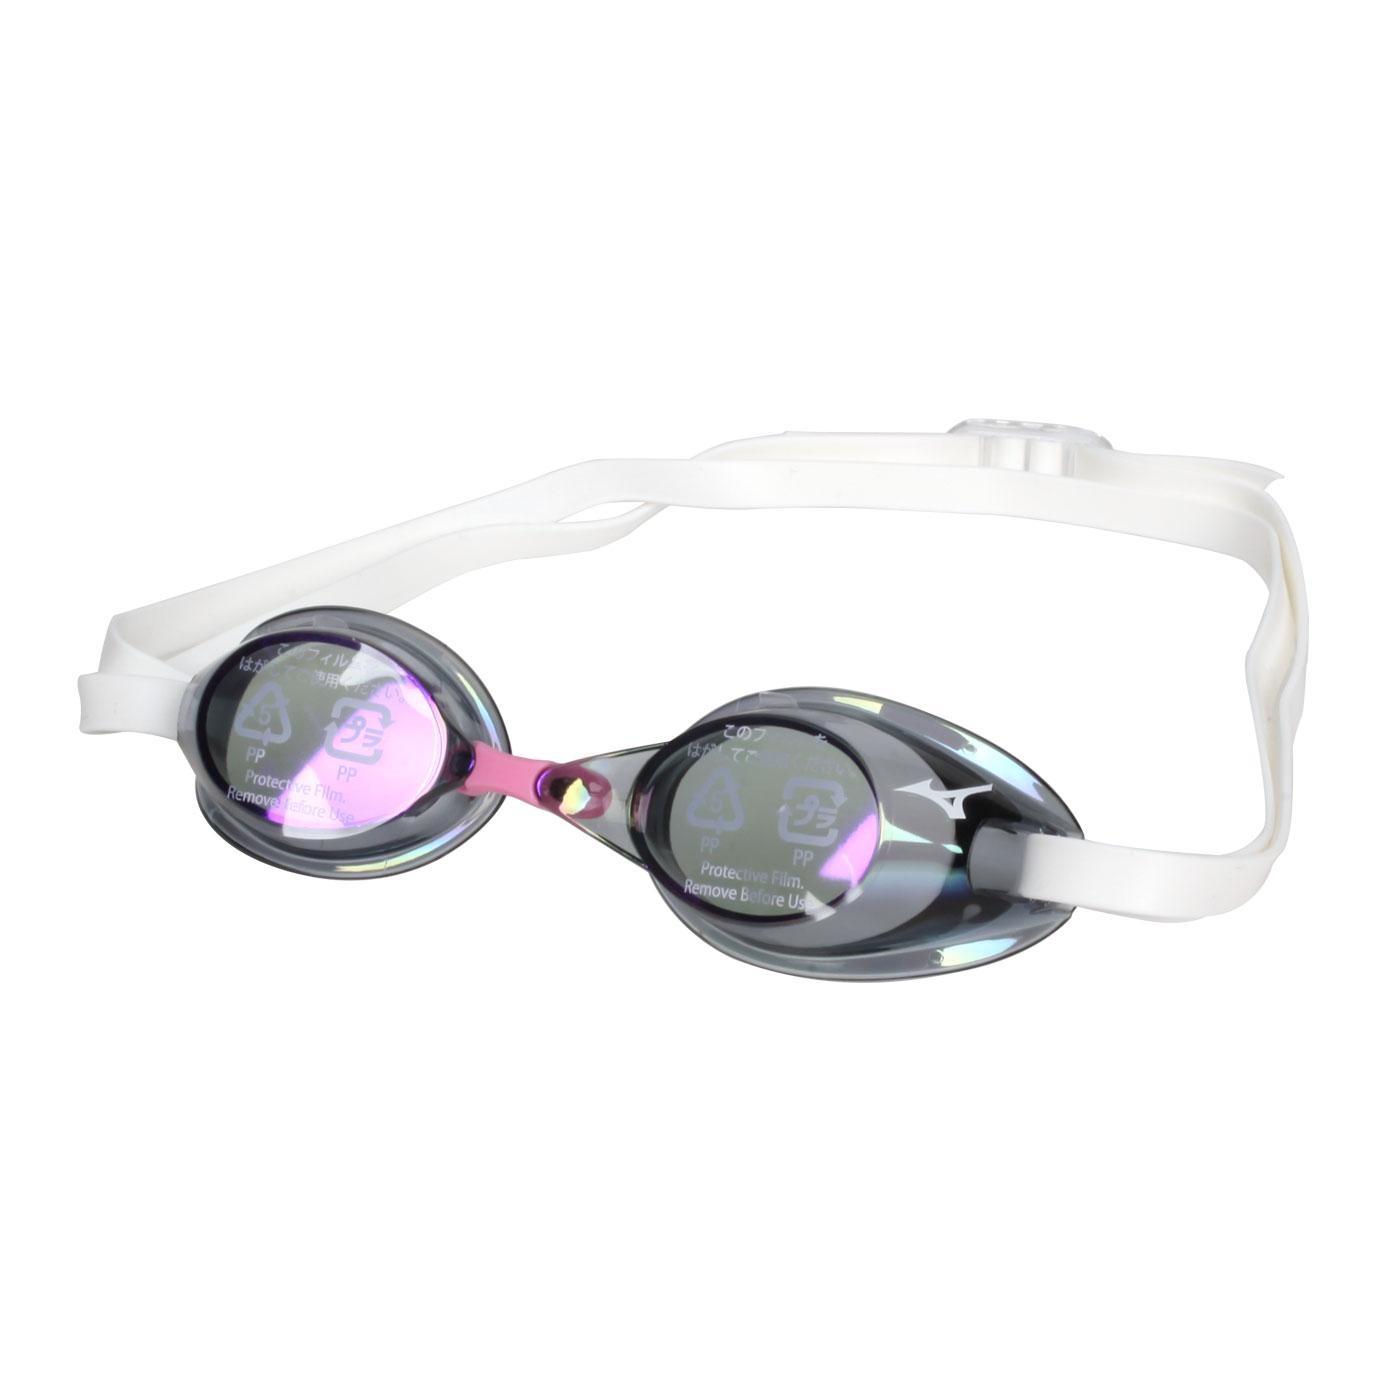 MIZUNO 泳鏡  SWIM85YA-75100-07 - 紫粉白